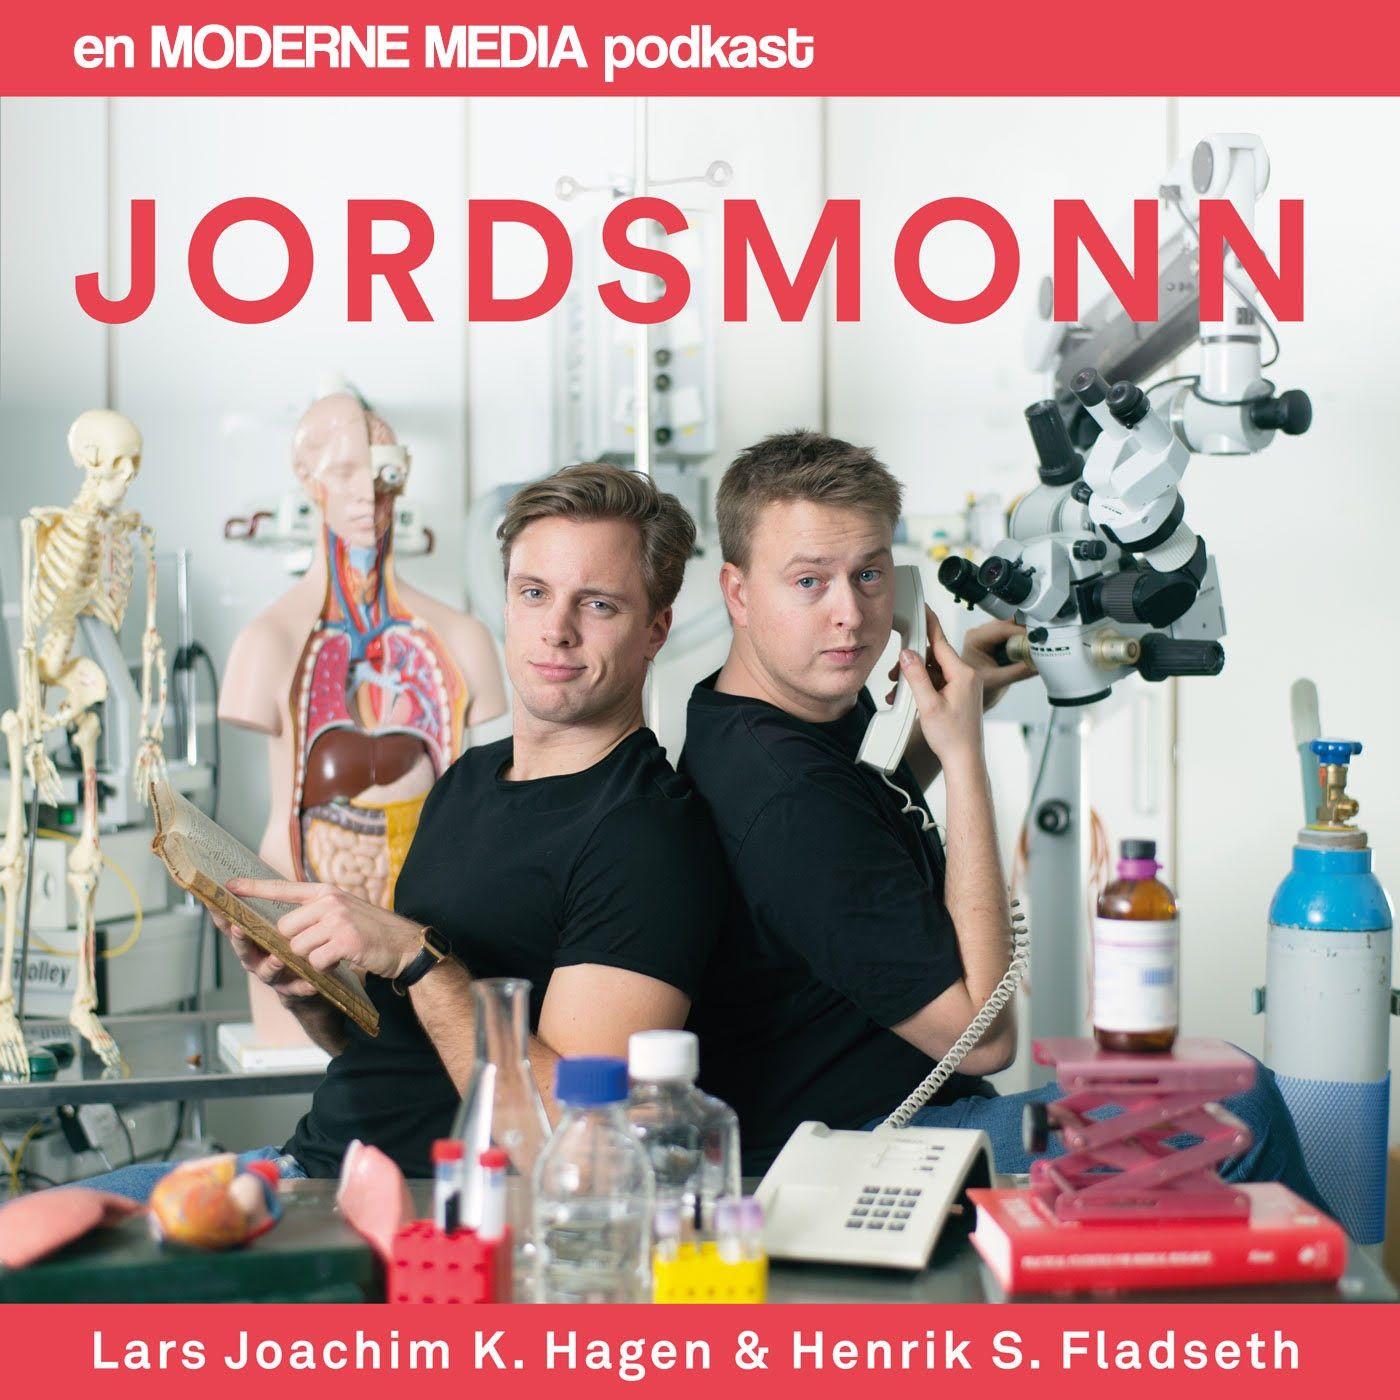 Jordsmonn